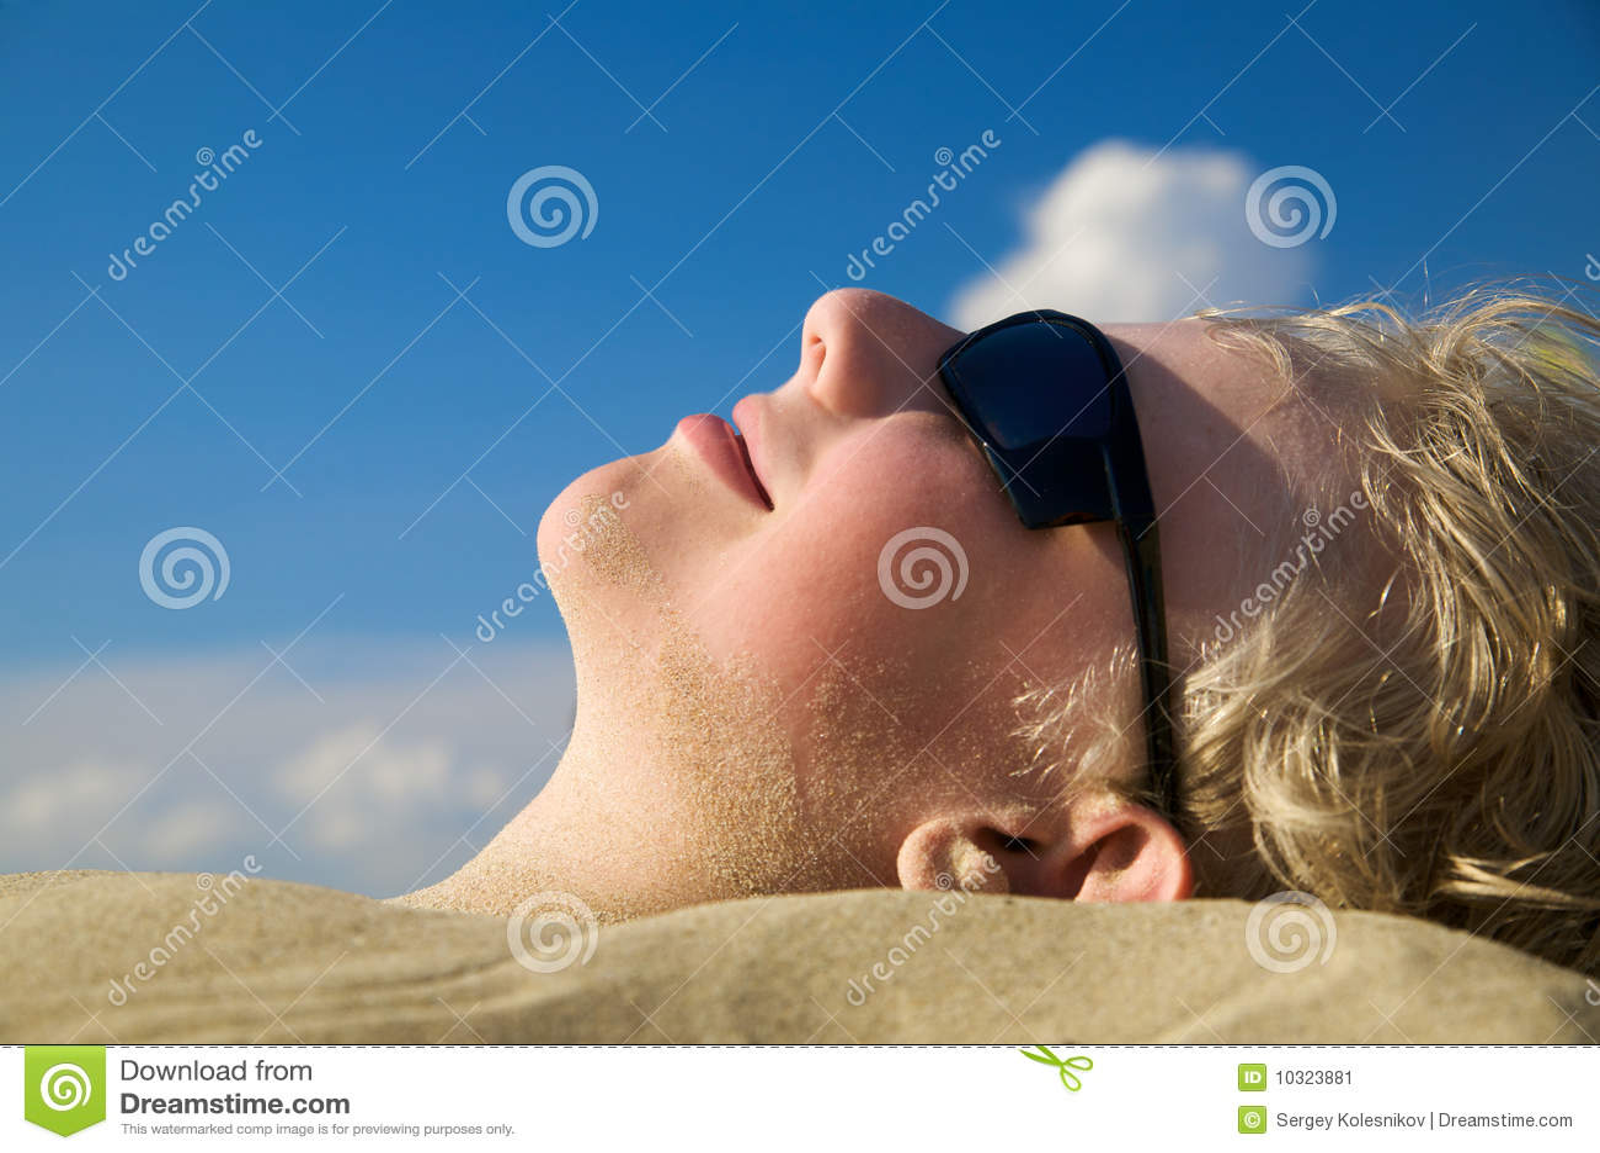 Boy relaxing on summer beach in sunglasses